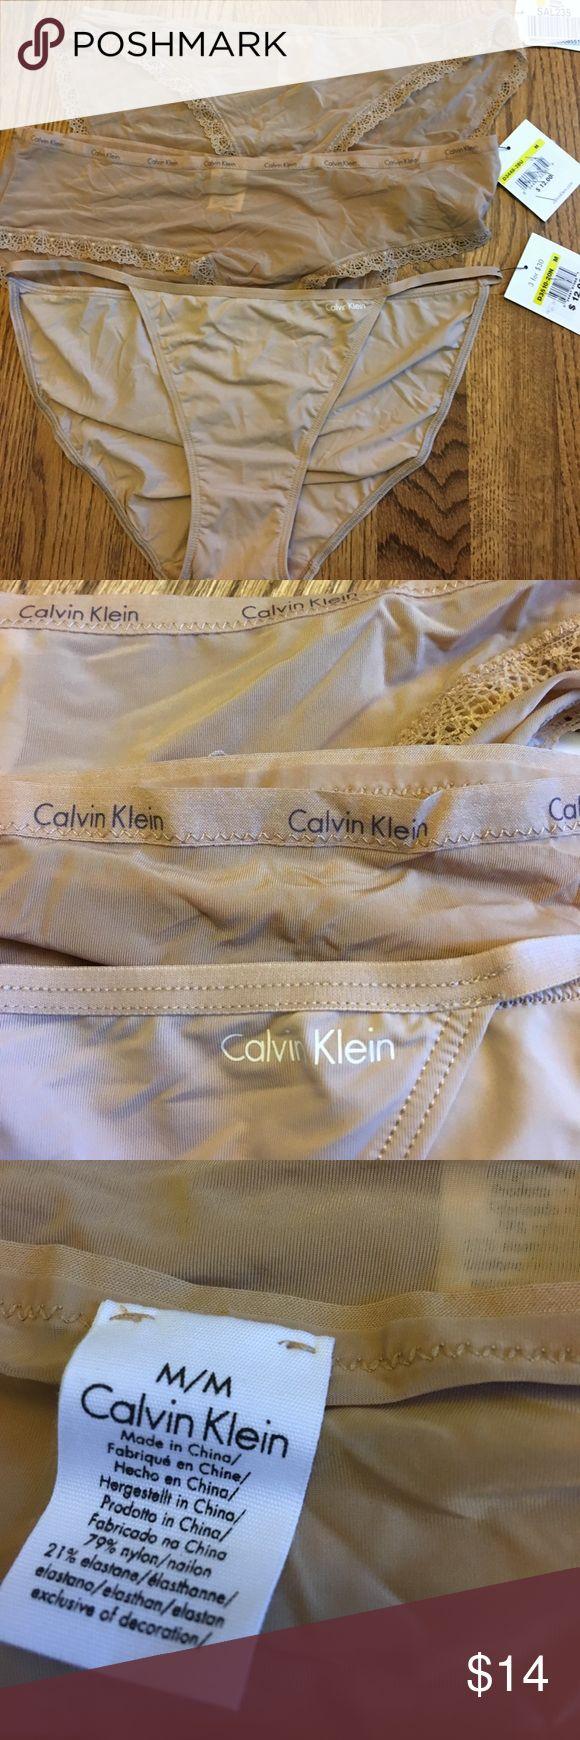 Calvin Klein lot of 3 bikini panties NUDE sz m Lot of 3 bikini panties Calvin Klein Intimates & Sleepwear Panties